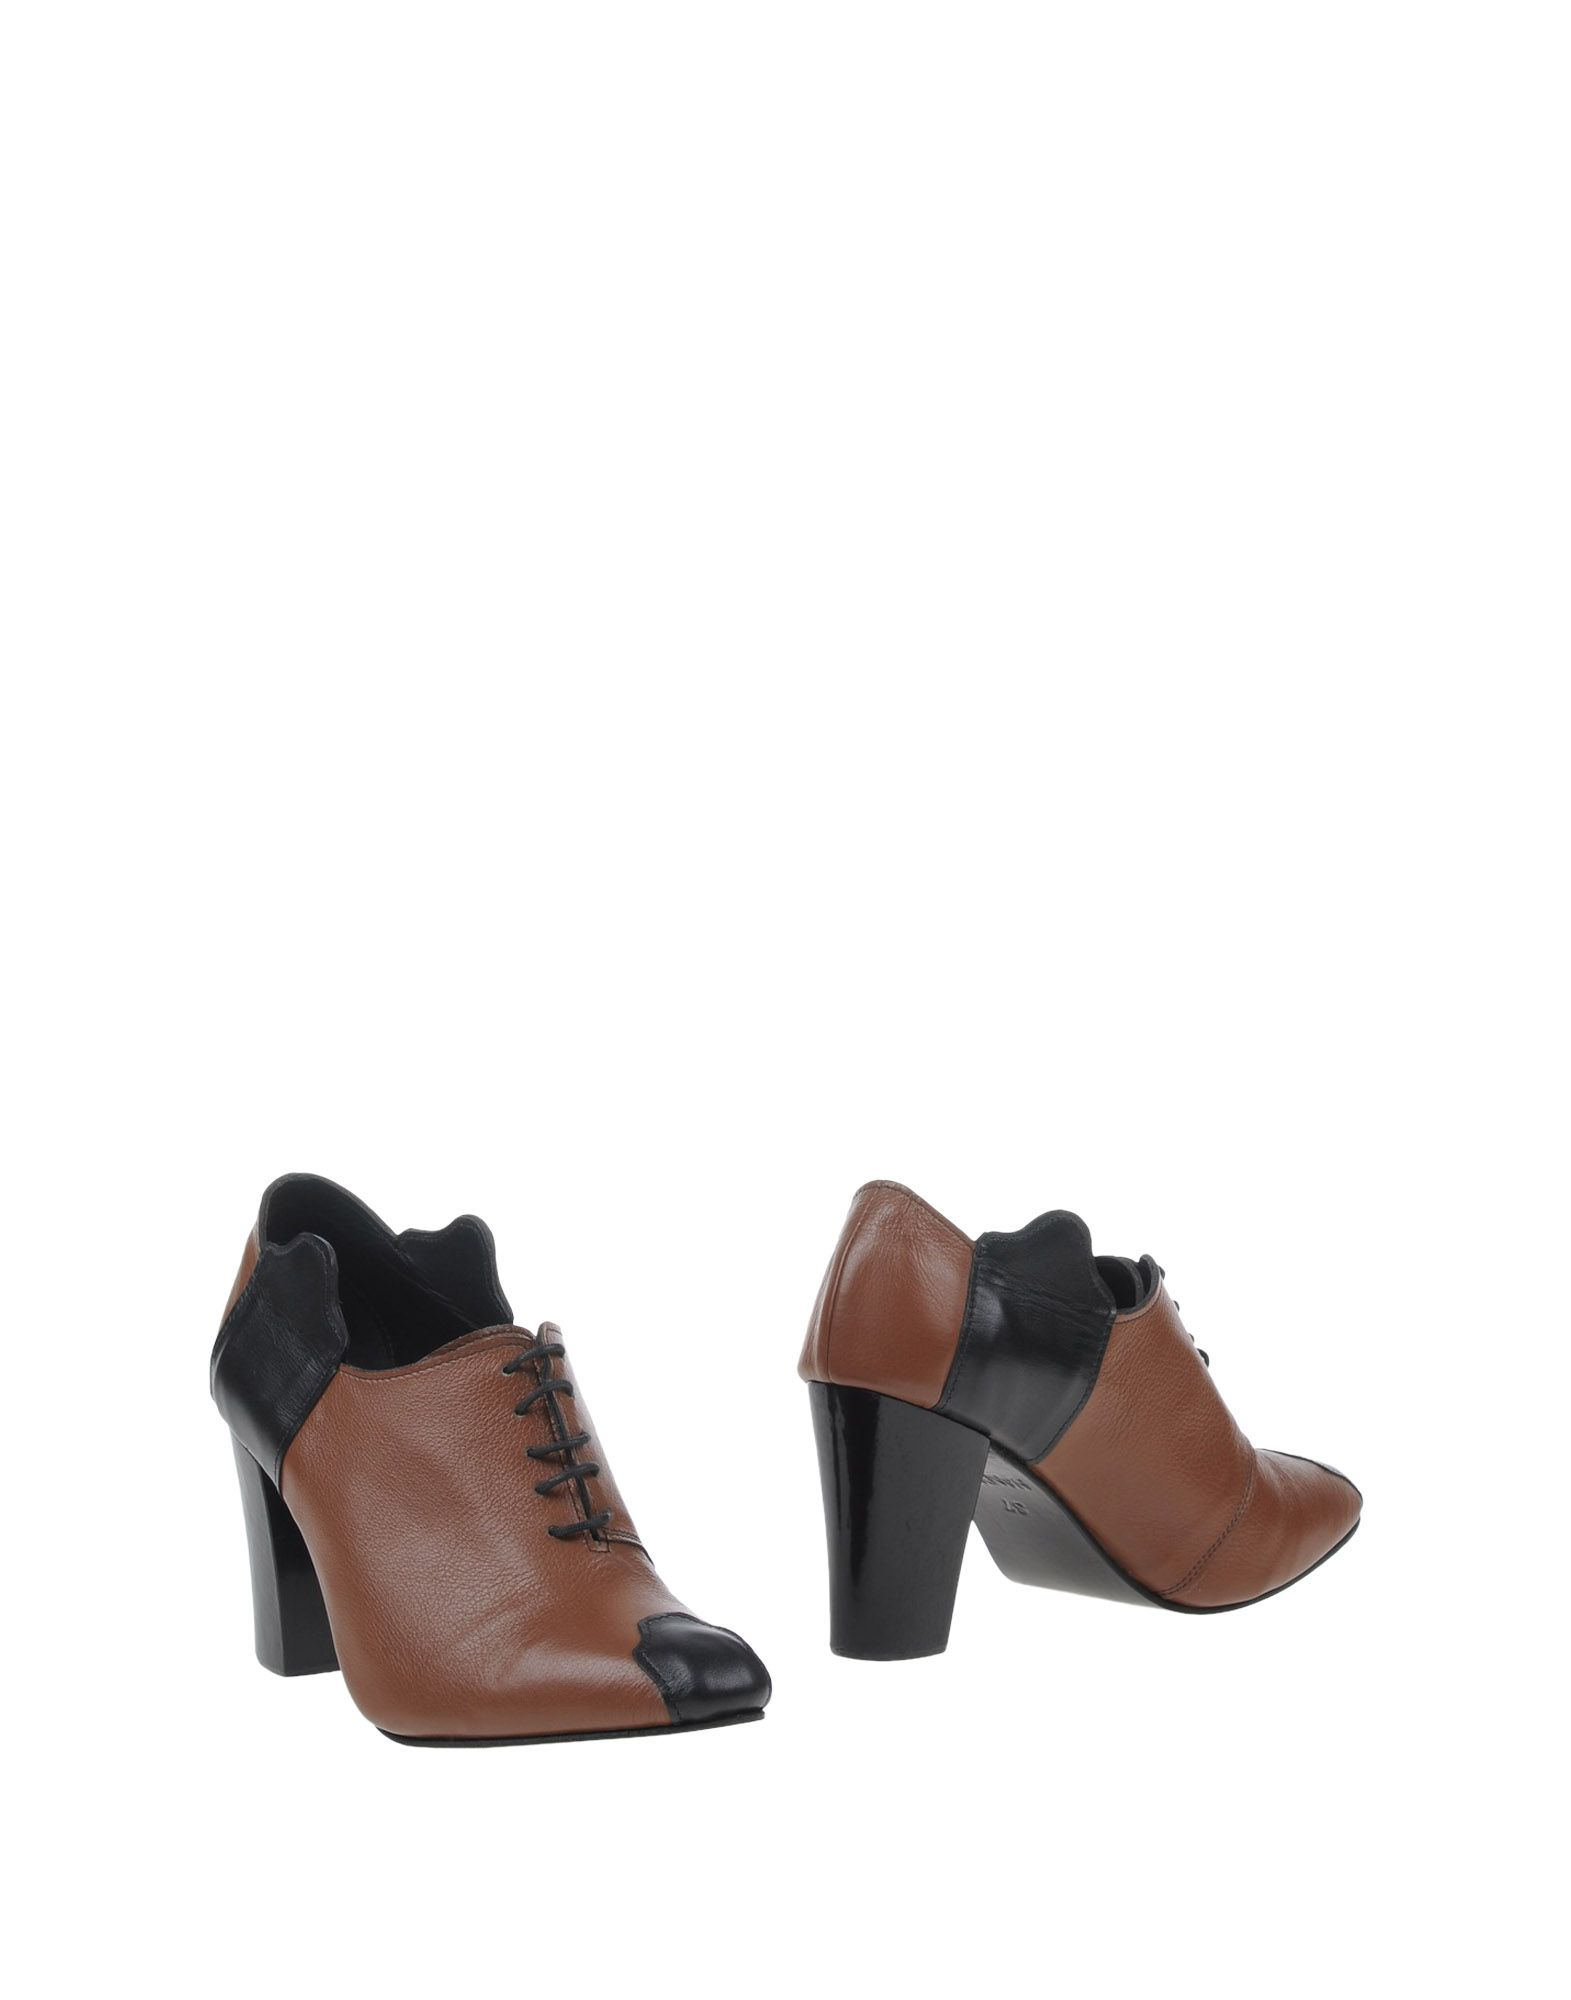 ALEX SCHRIJVERS Обувь на шнурках цены онлайн